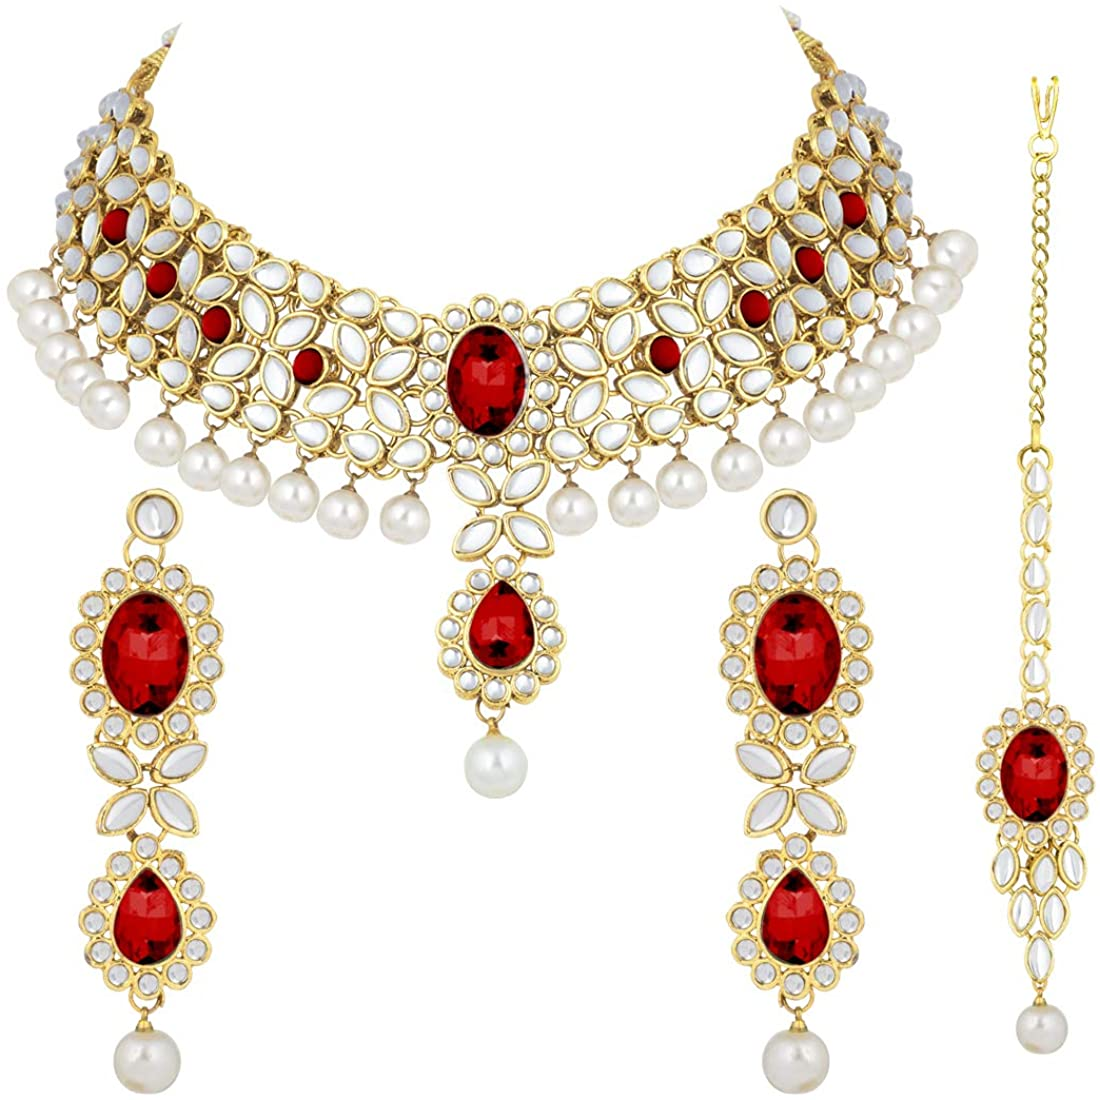 Aheli Indian Wedding Wear Beaded Faux Kundan Pearl Necklace Set with Maang Tikka Ethnic Fashion Jewelry for Women